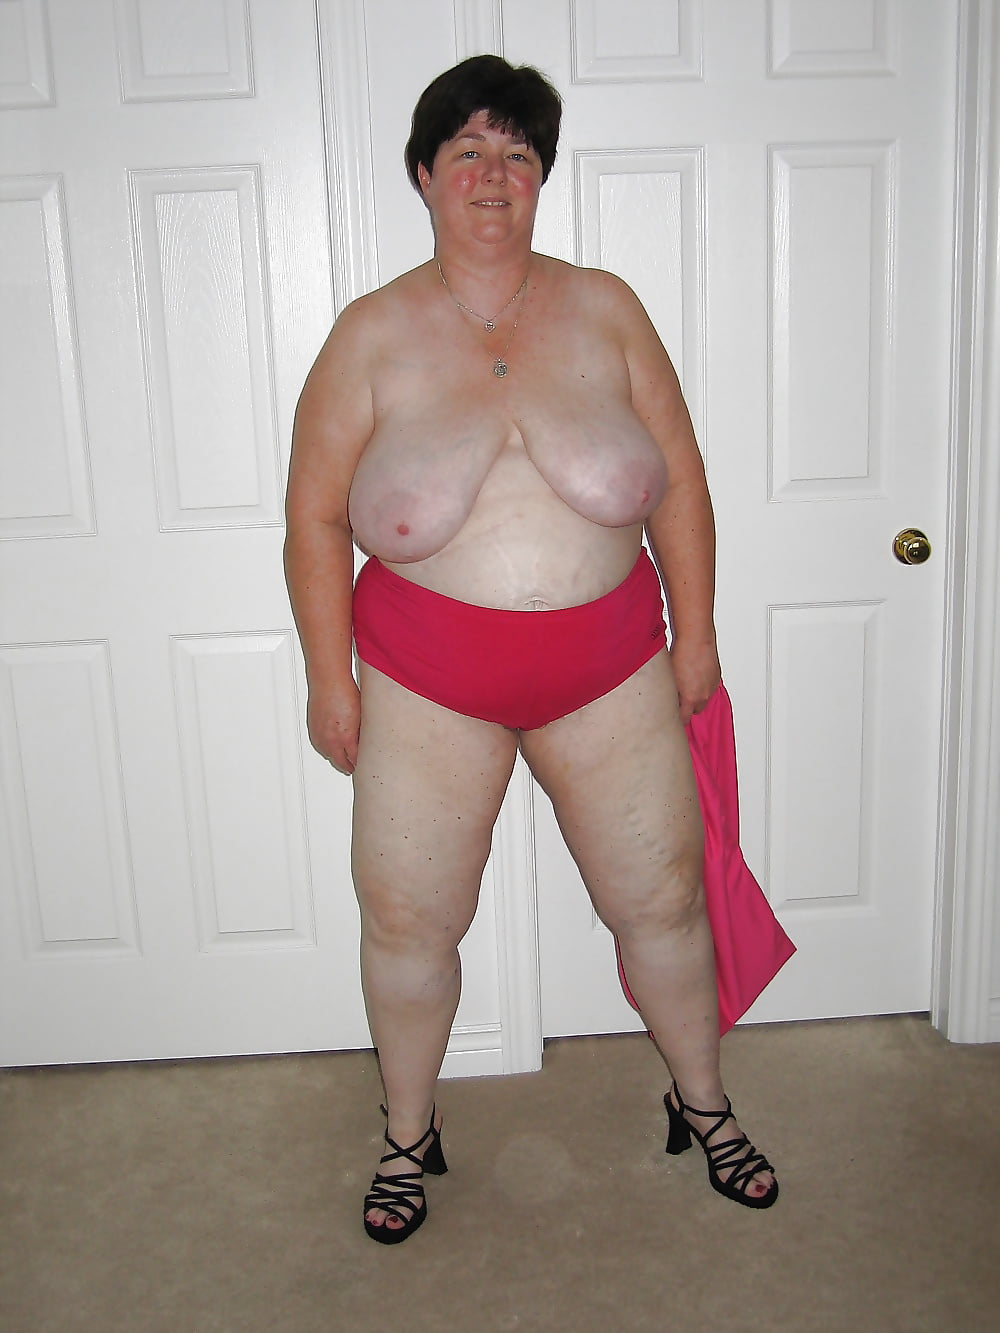 Fatty patty sex